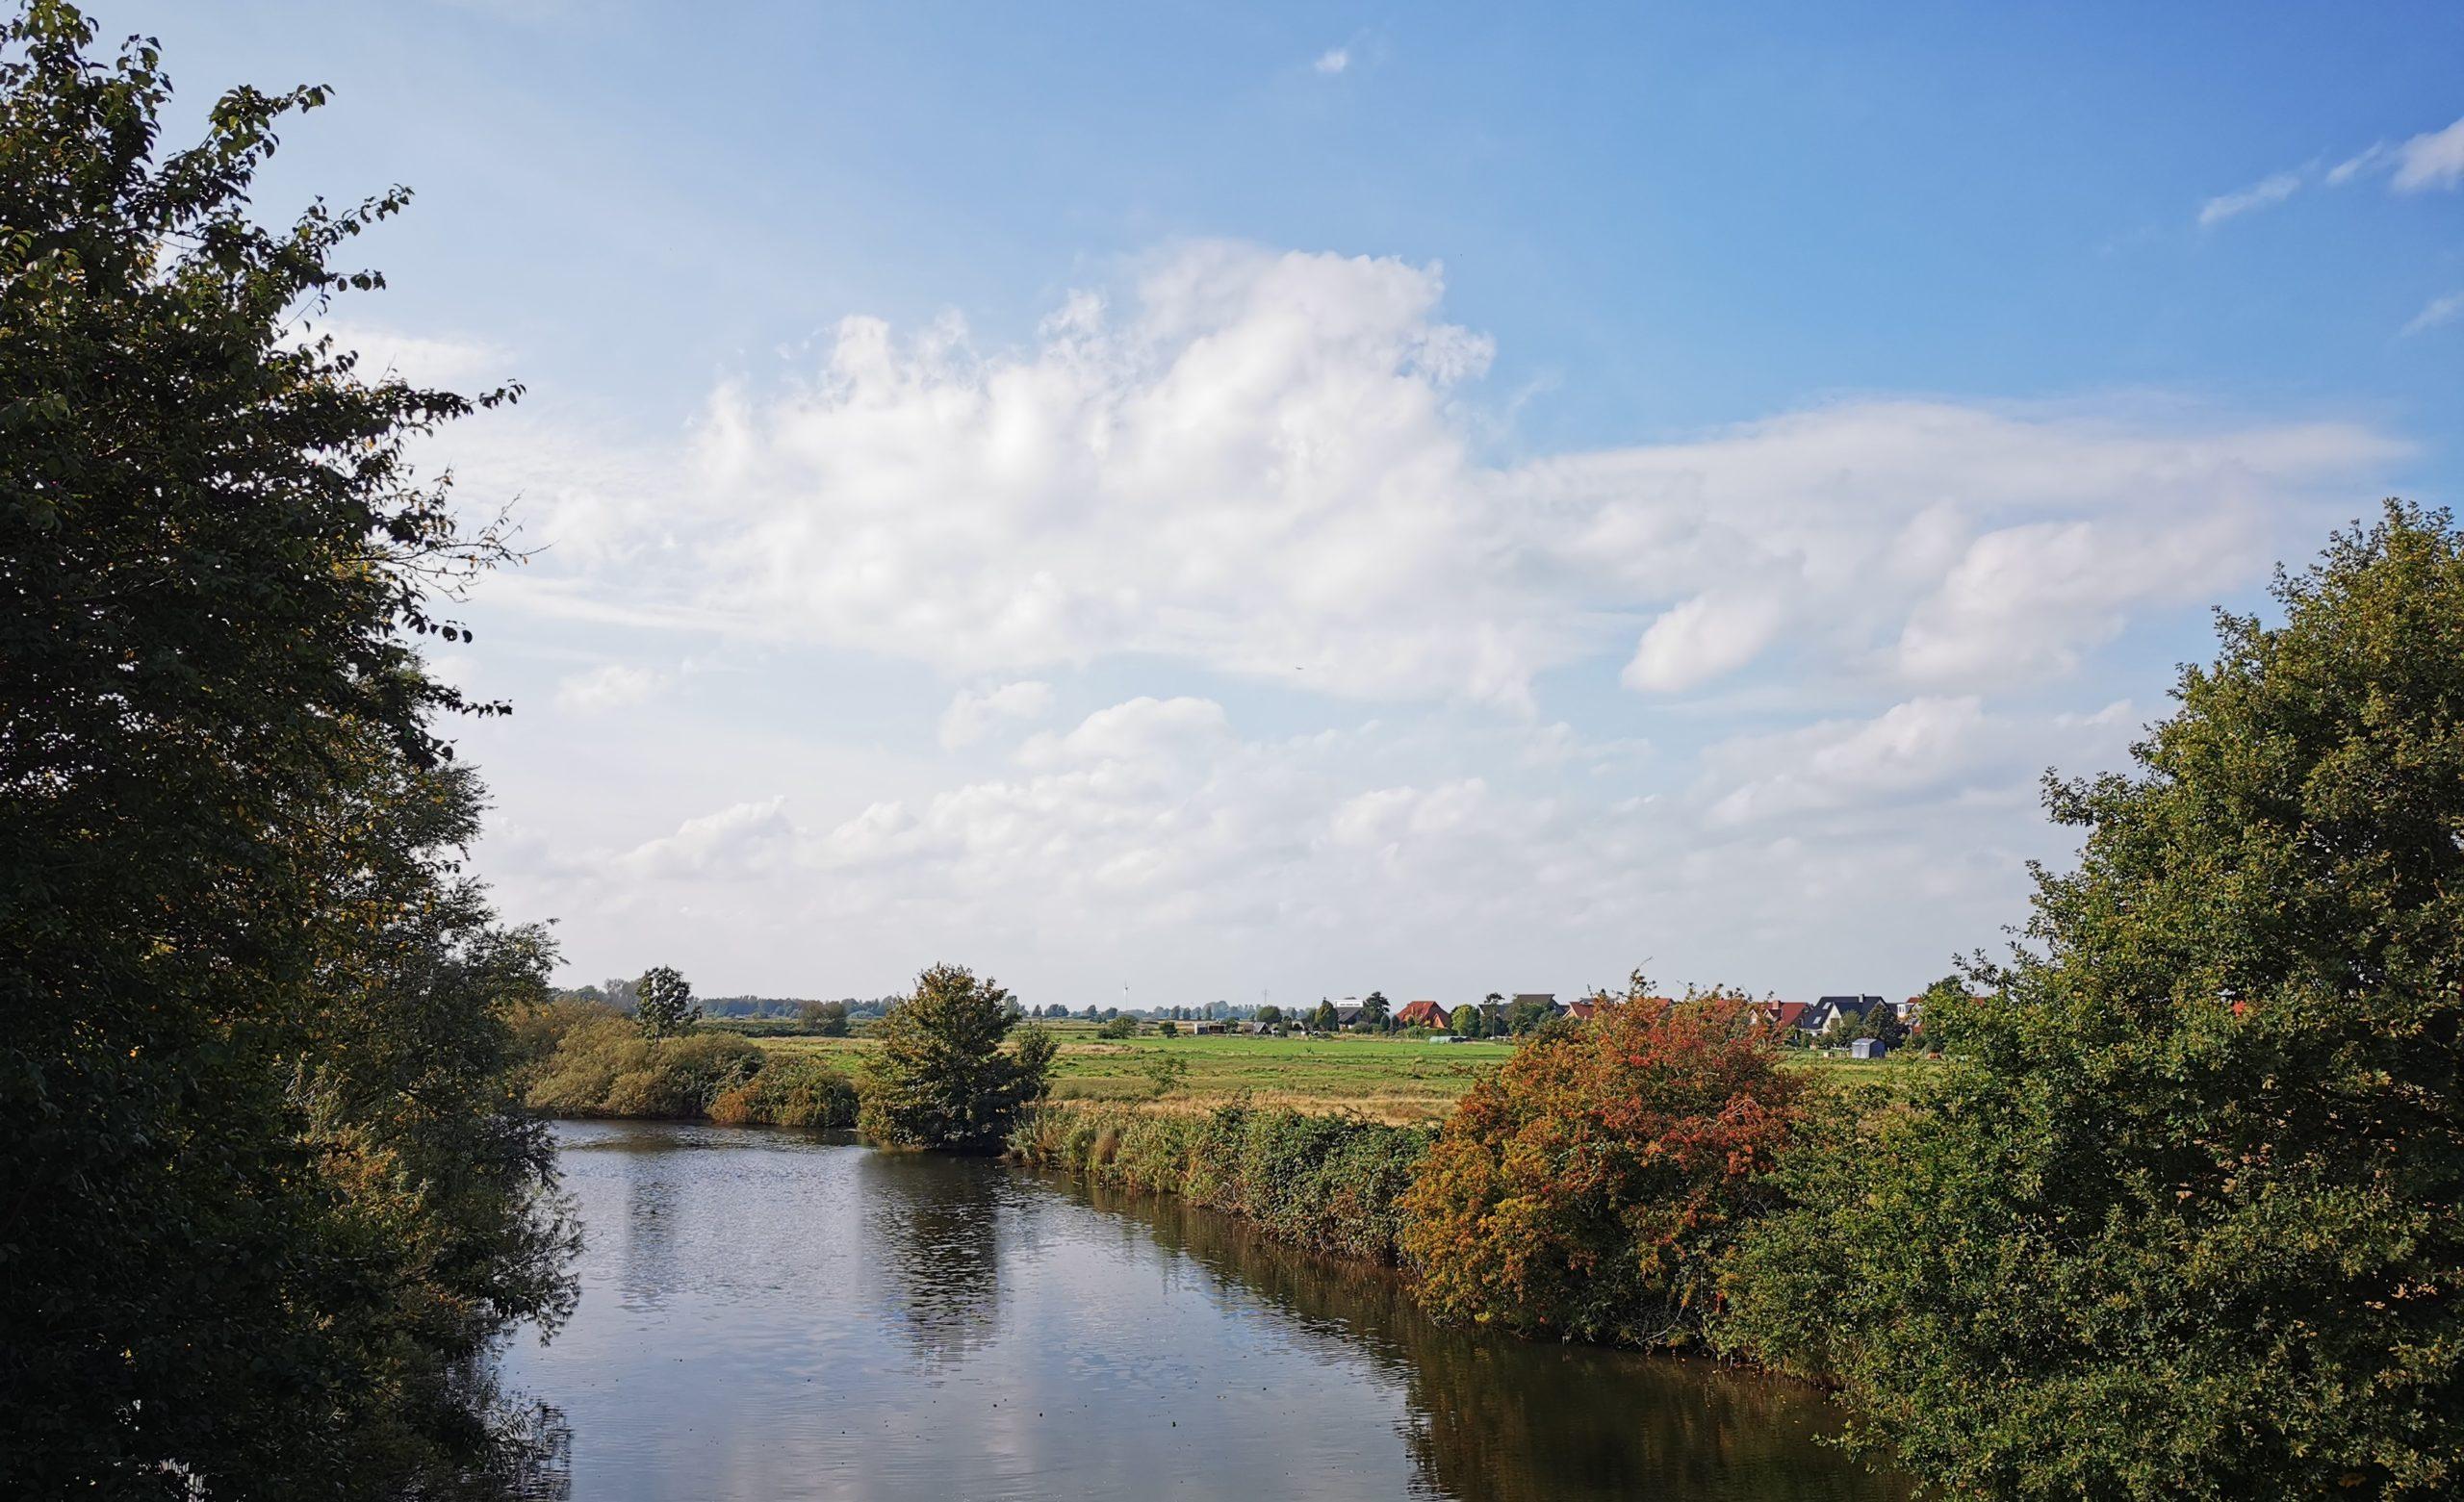 Conrebbersweg